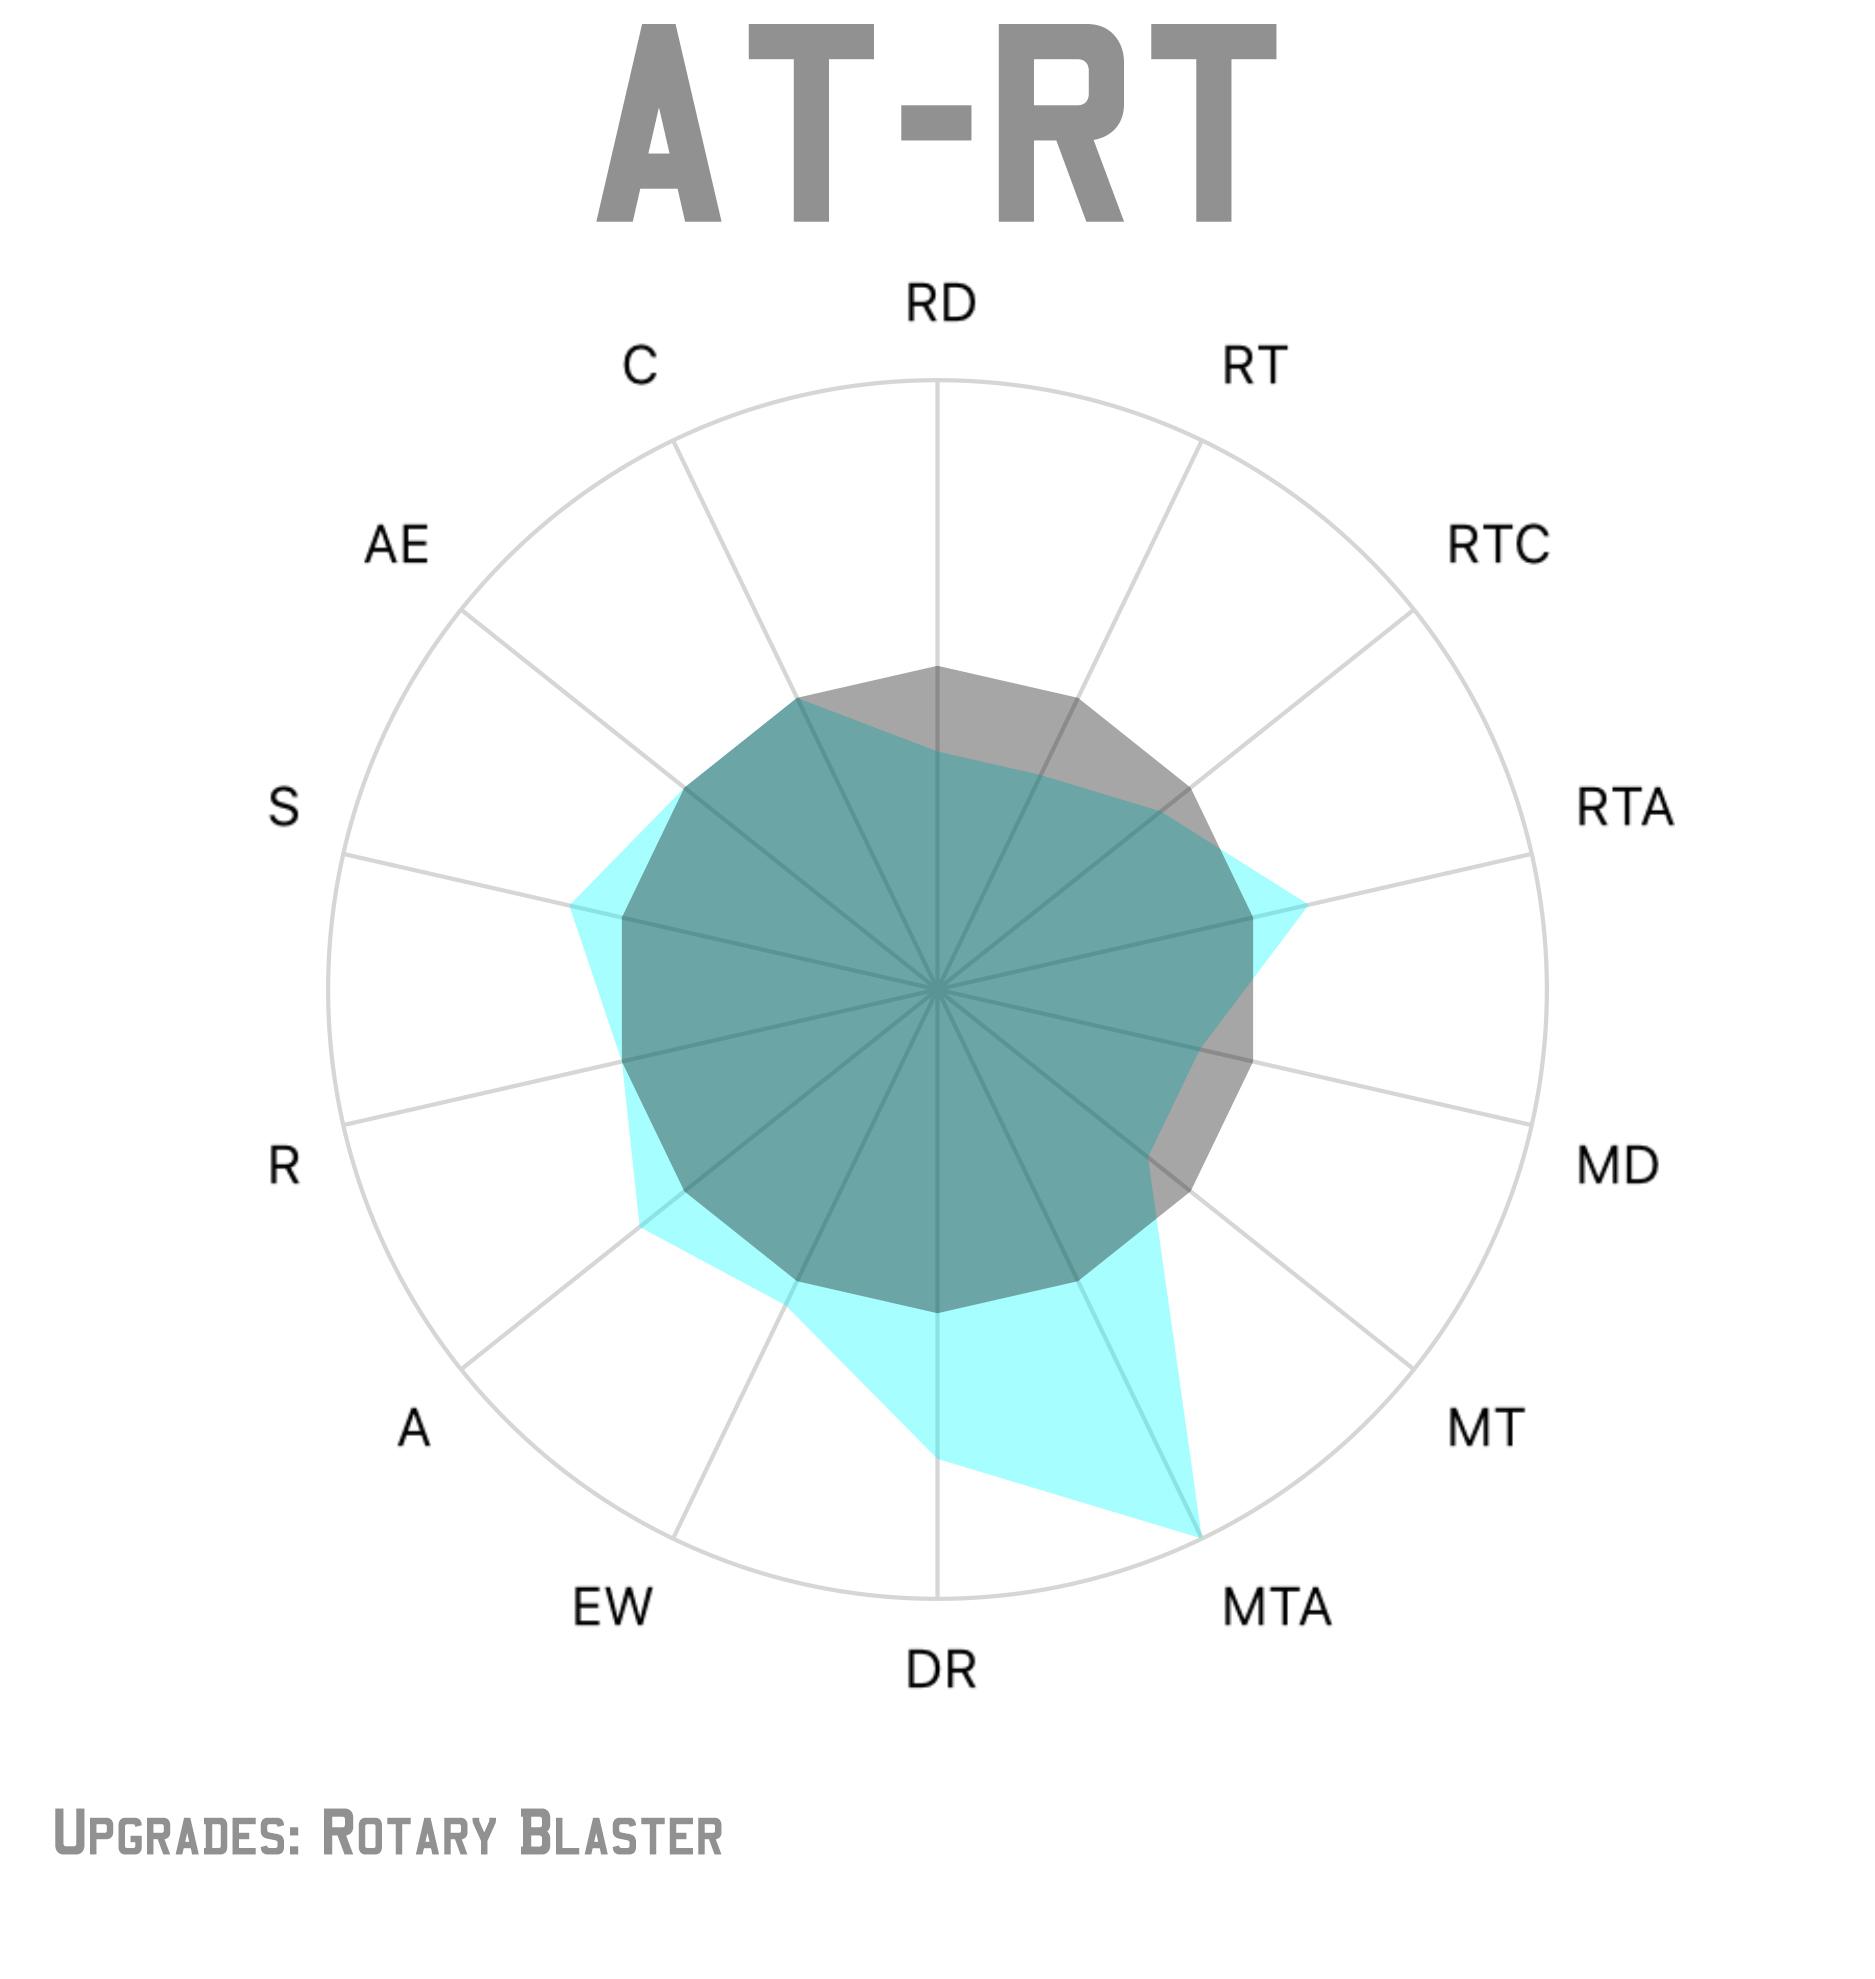 ATRT_Rotary.jpg